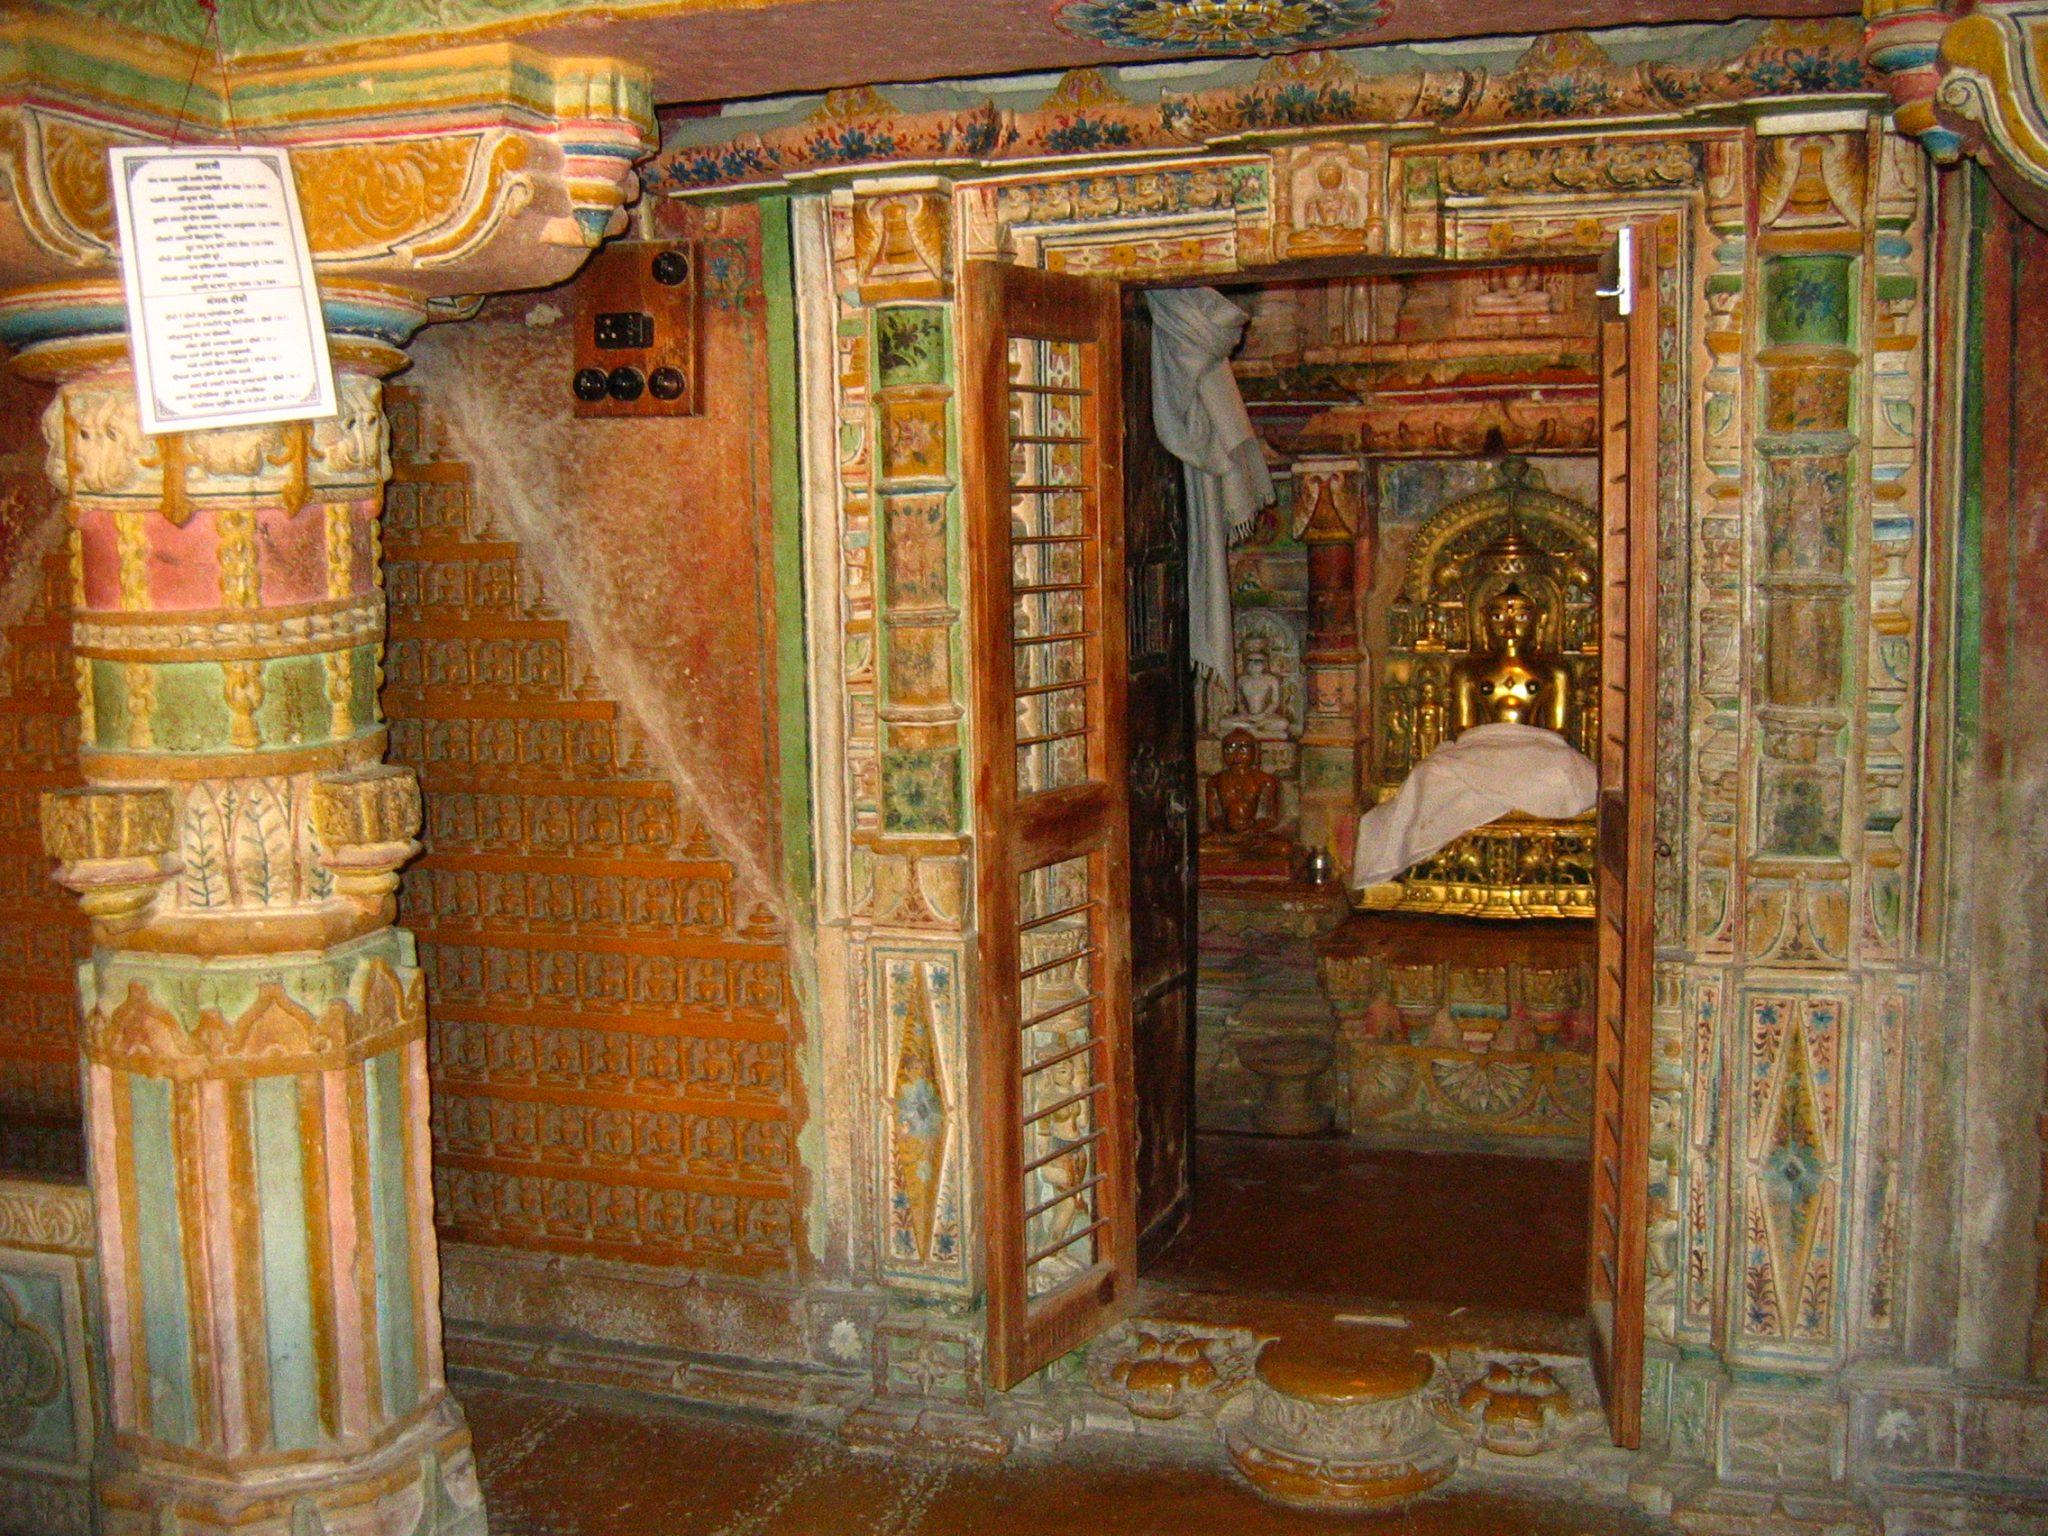 Inside of Jain Temple